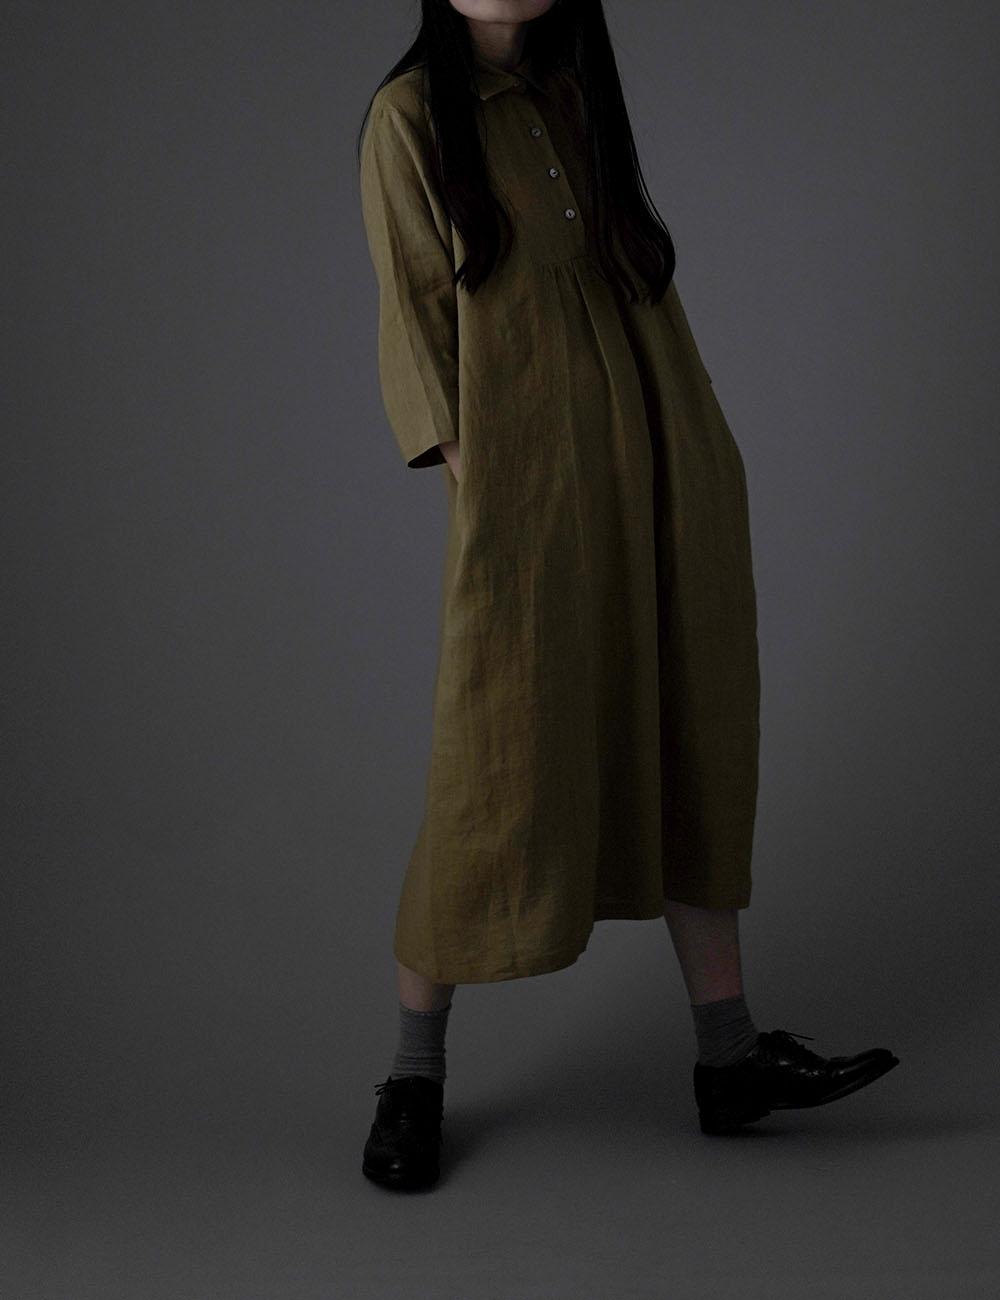 【wafu】 雅亜麻 リネン ワンピース カッタウェイ シャツ 襟 フロント ギャザー ドレス 薄地/黄橡色(きつるばみ) a031a-kib1